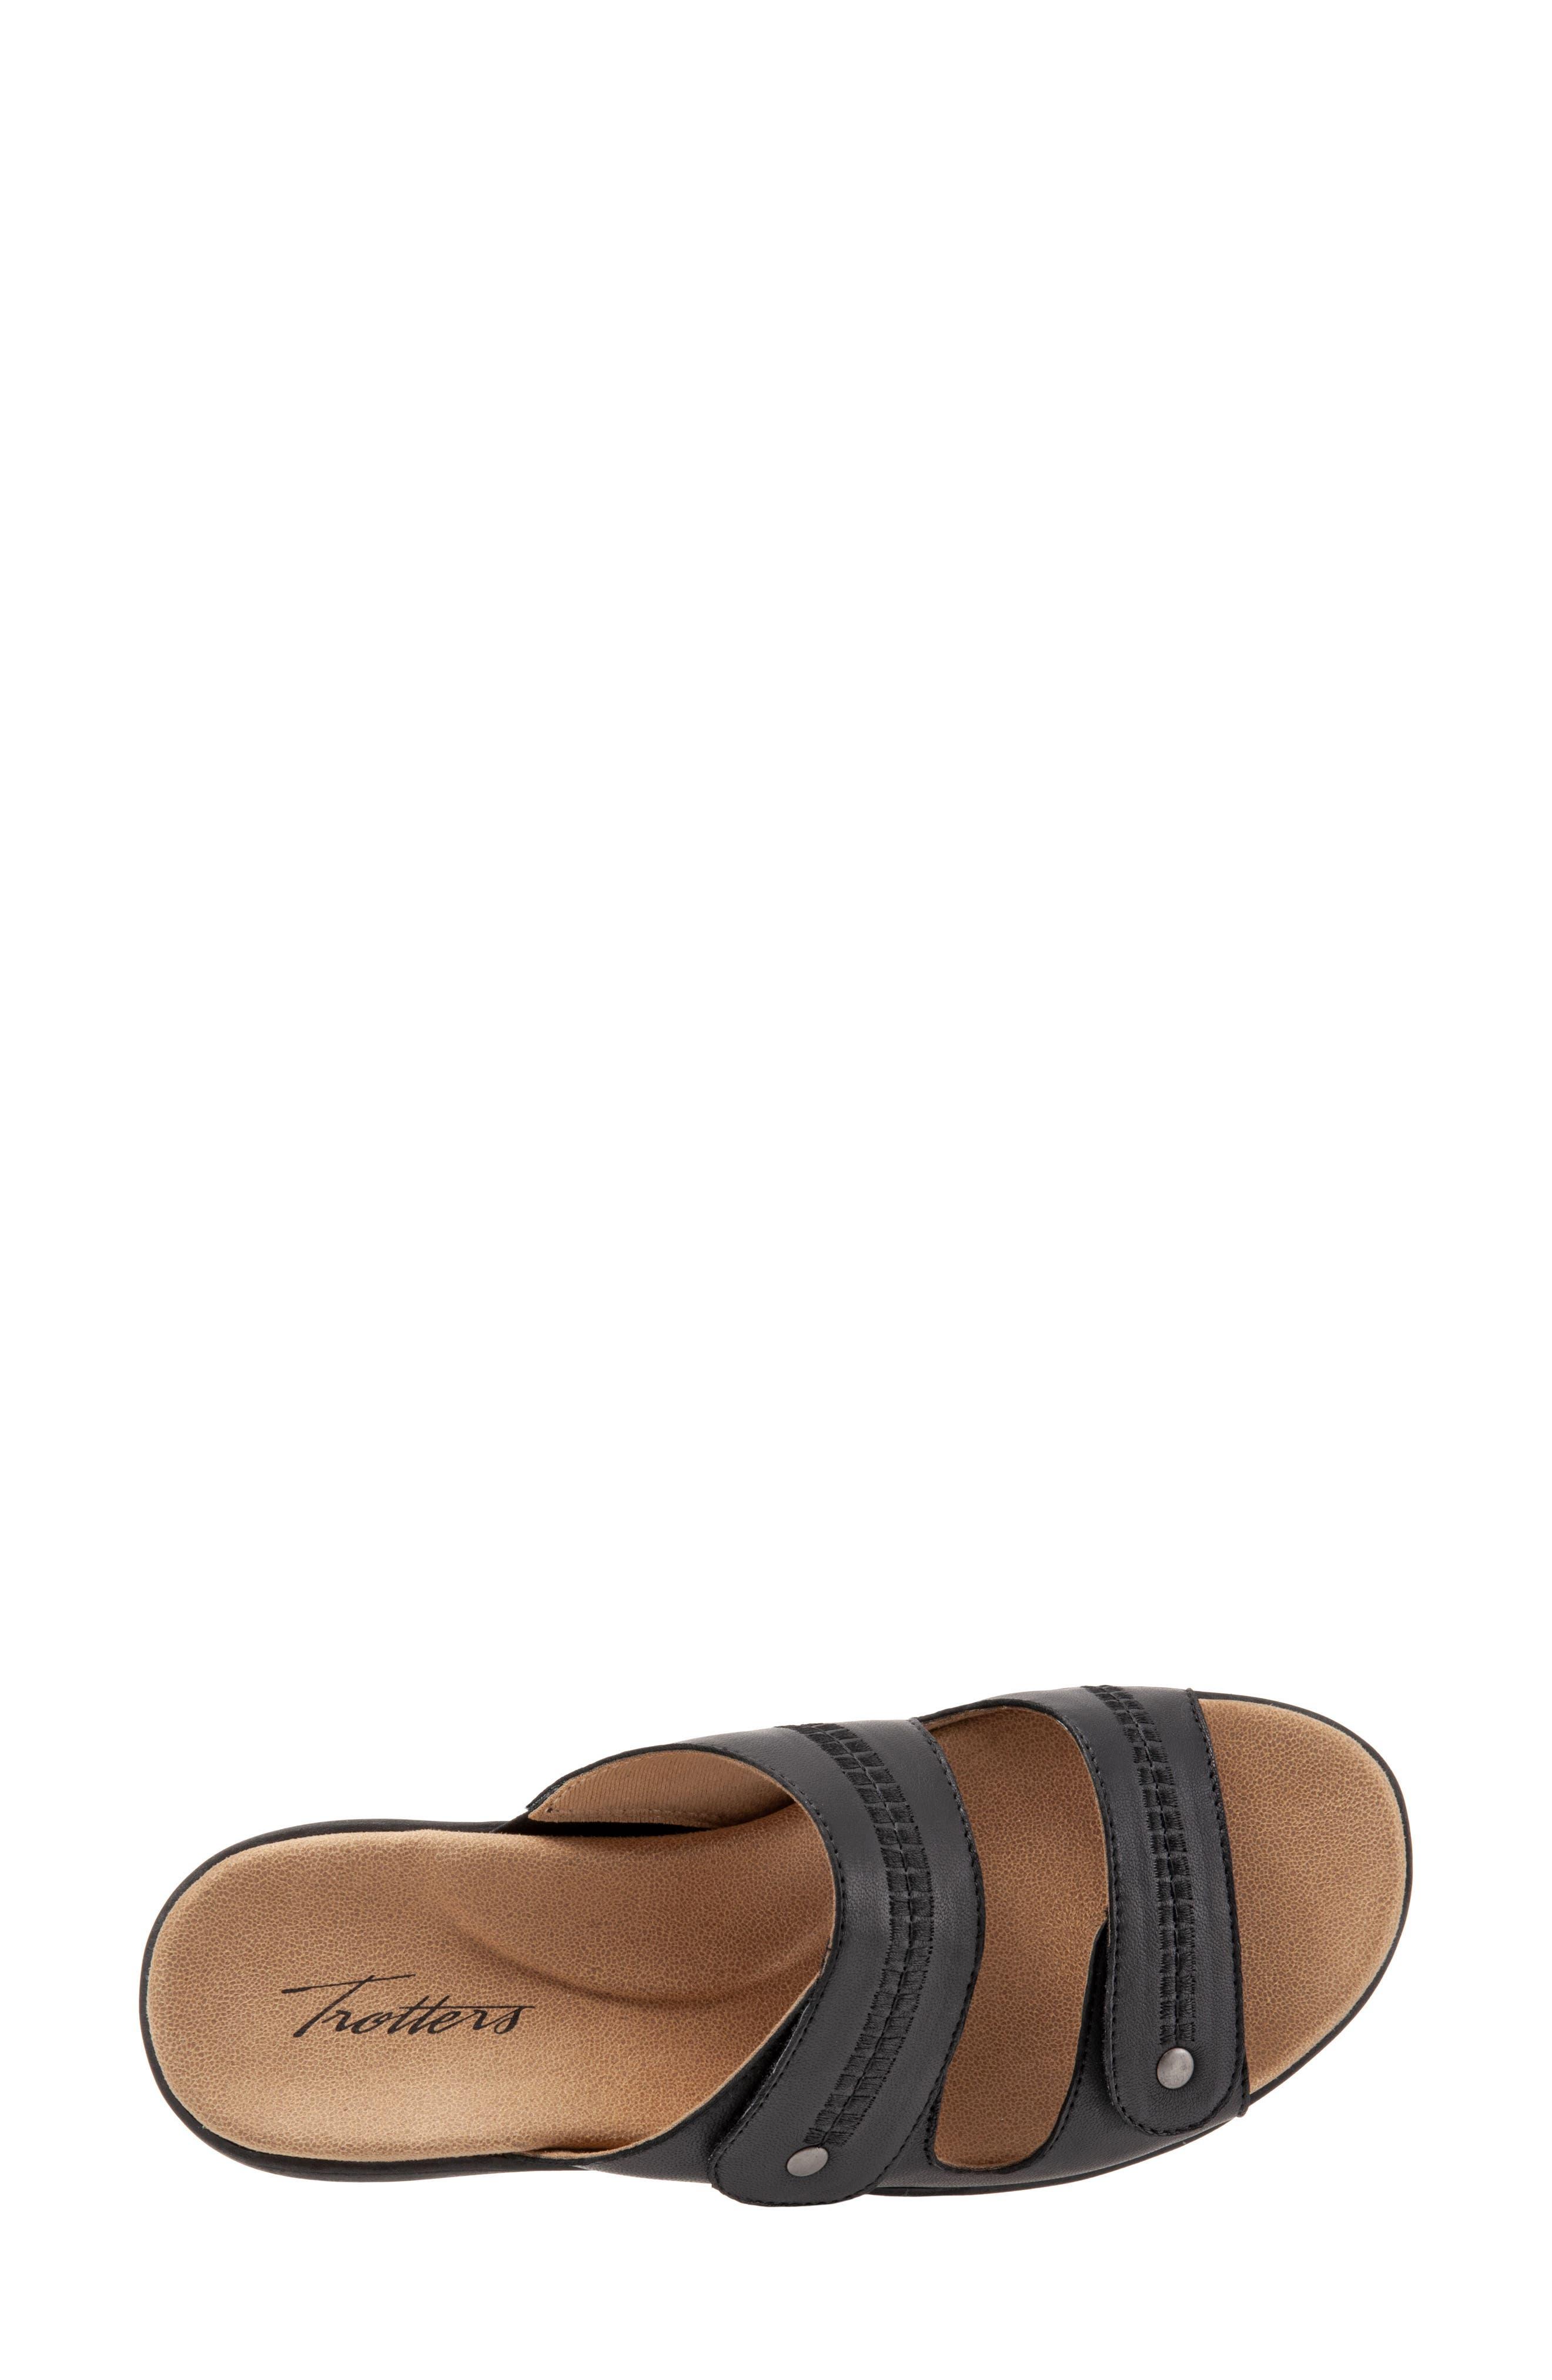 Vale Double Strap Slide Sandal,                             Alternate thumbnail 5, color,                             BLACK LEATHER